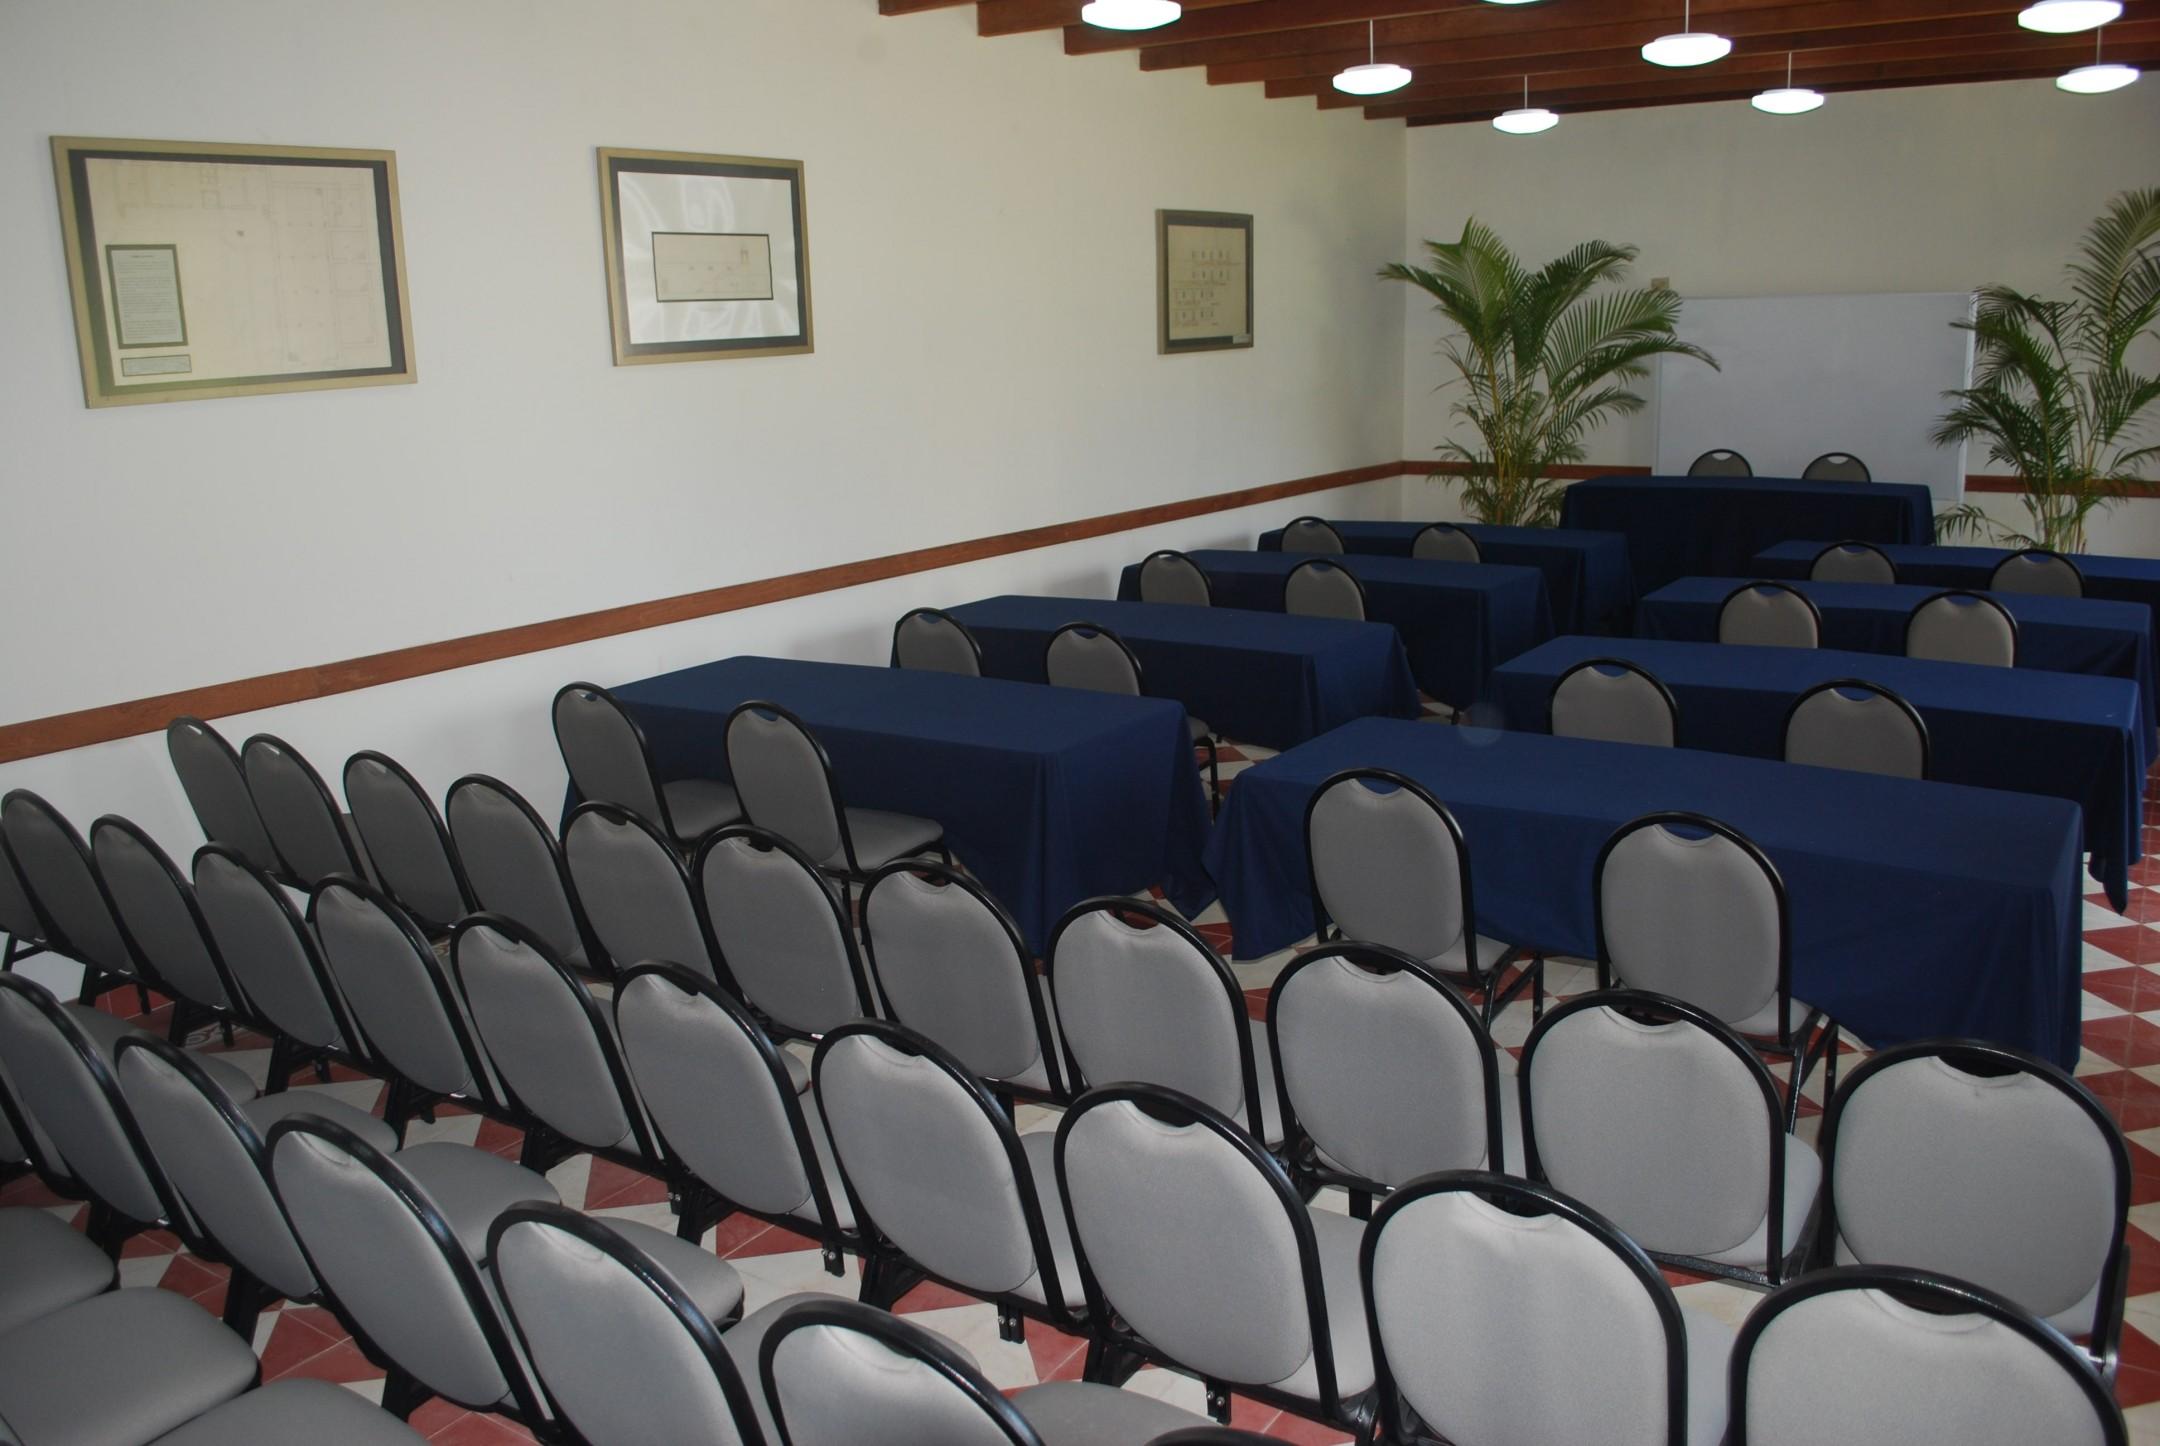 http://haciendabocanegra.com/images/chbn_p7TrYPciNH_large-1080_TudQc.JPG